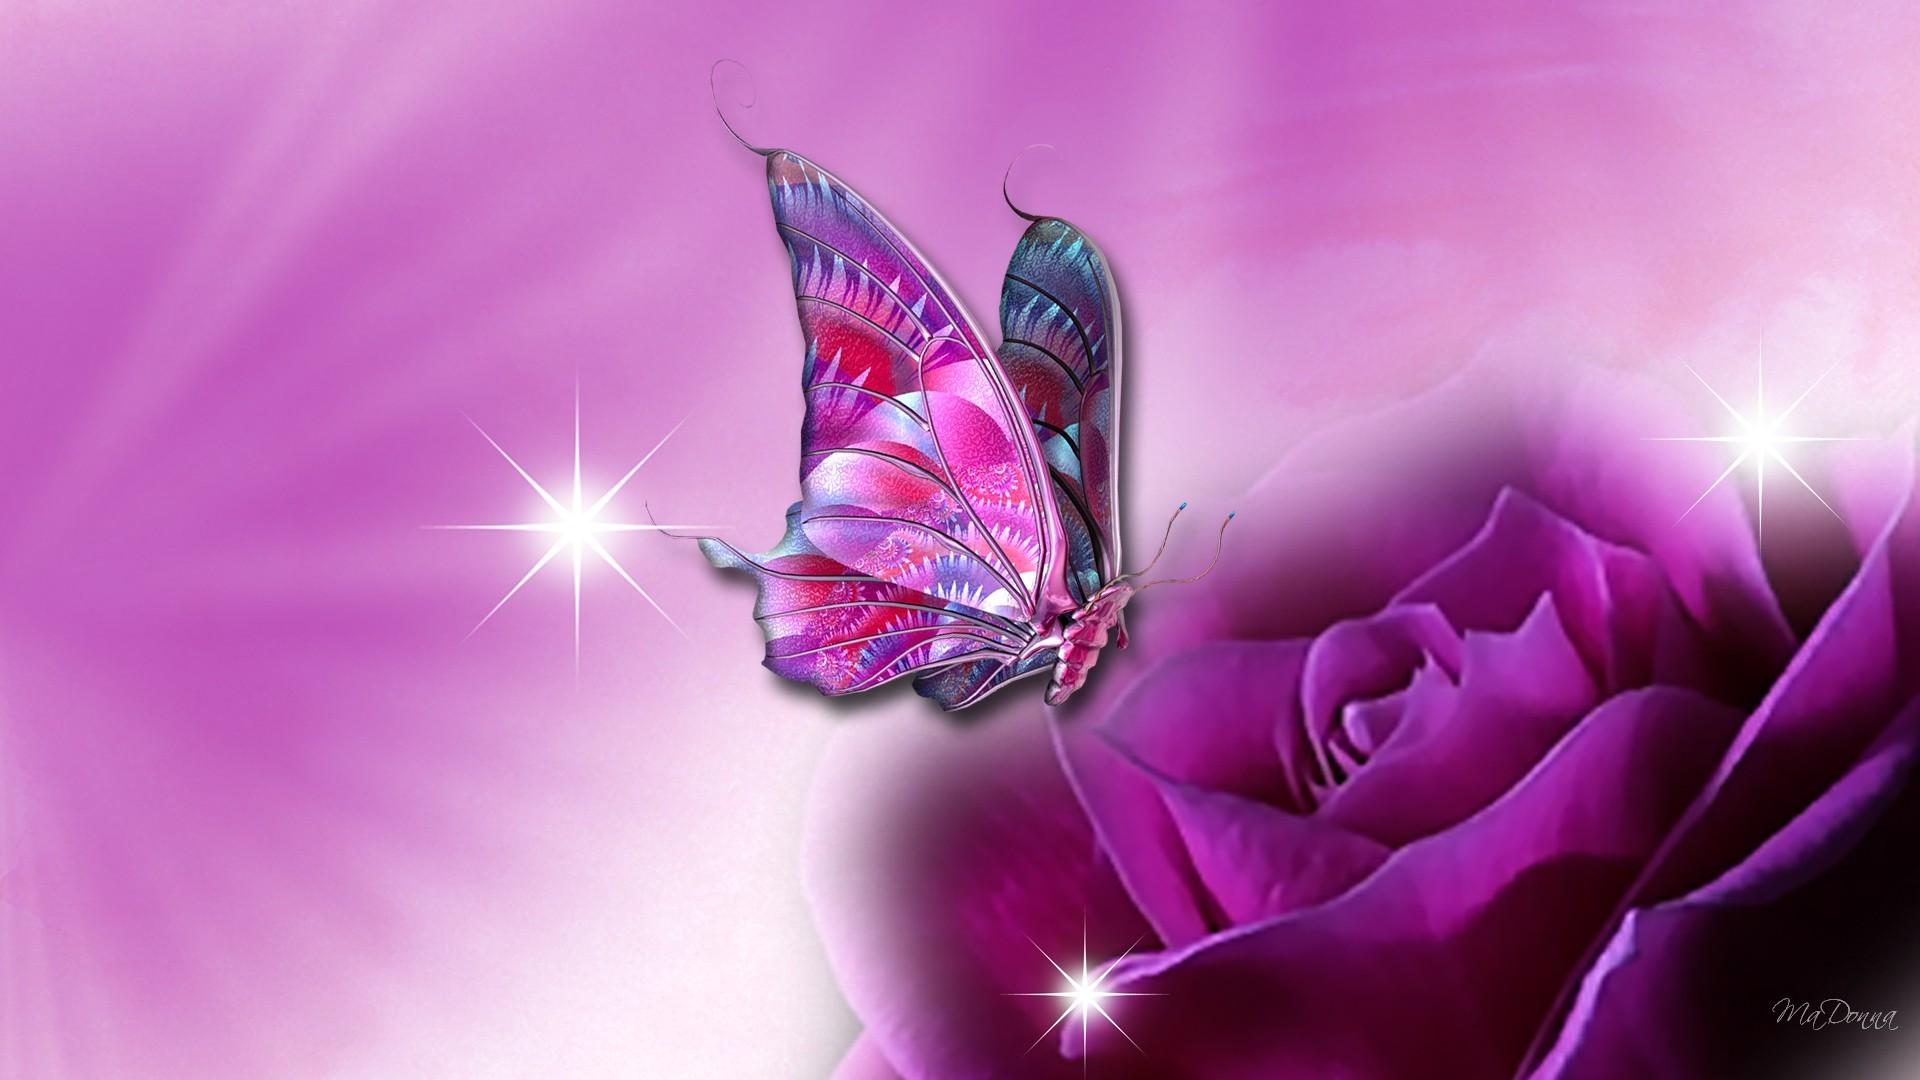 Butterflies Wallpaper, wallpaper, Butterflies Wallpaper hd wallpaper .